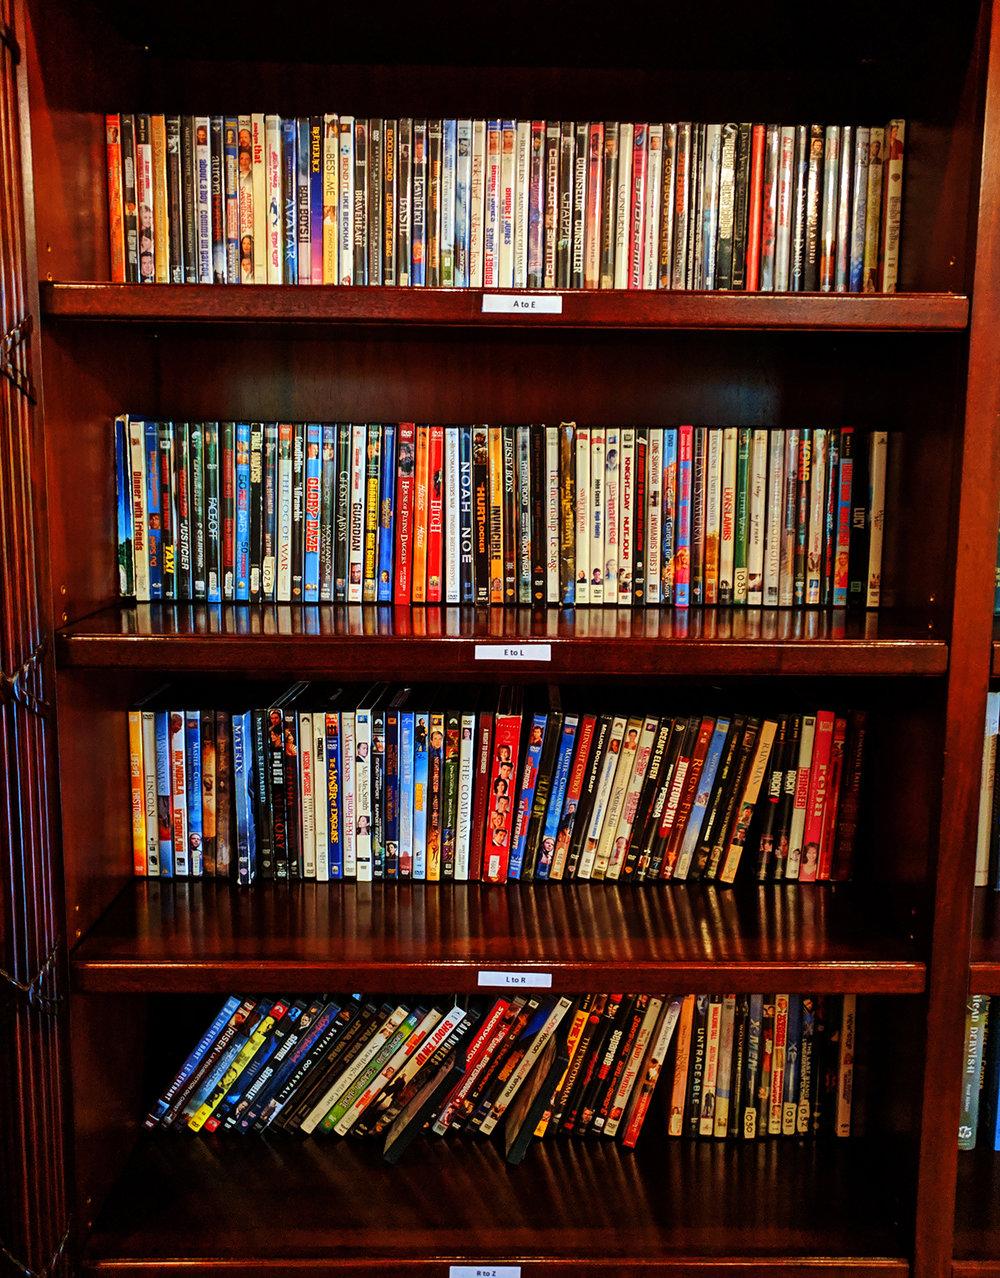 Abigails-lounge-bookshelf.jpg